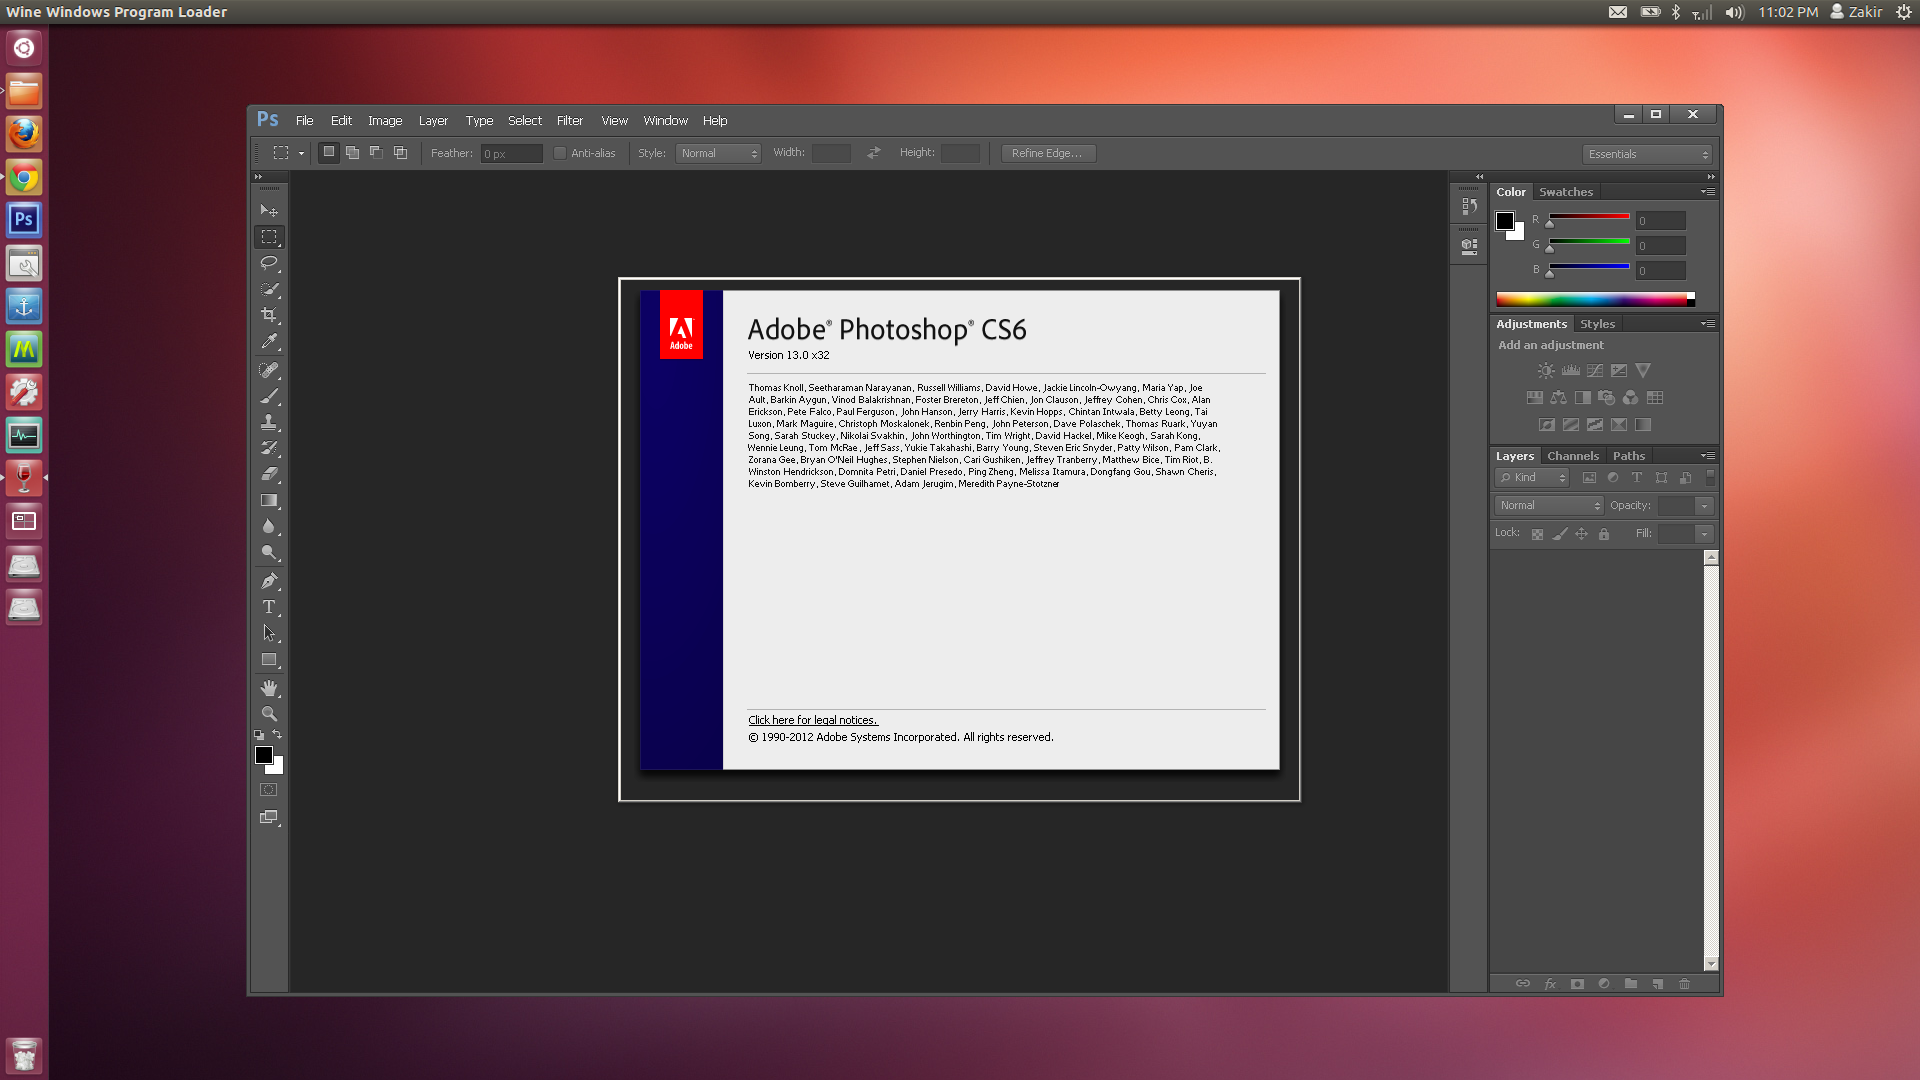 Ubuntu 124lts with photoshop cs6 by mbossg on deviantart ubuntu 124lts with photoshop cs6 by mbossg ccuart Choice Image